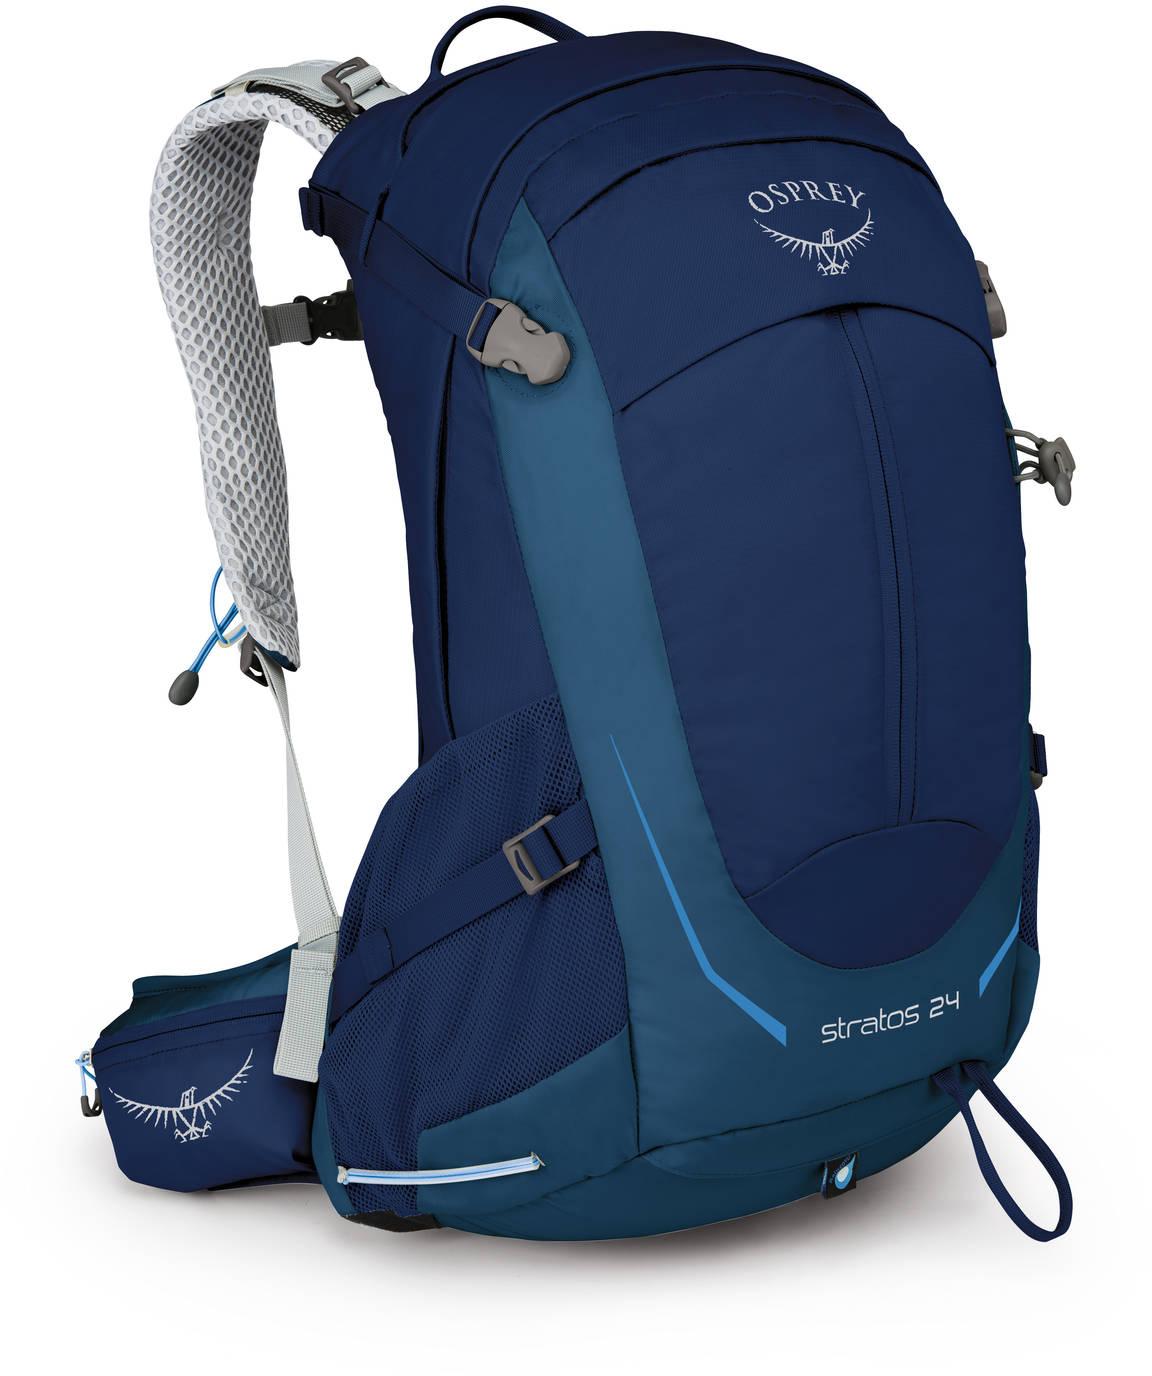 Туристические рюкзаки Рюкзак туристический Osprey Stratos 24 Stratos_24_S17_Side_Eclipse_Blue_web.jpg